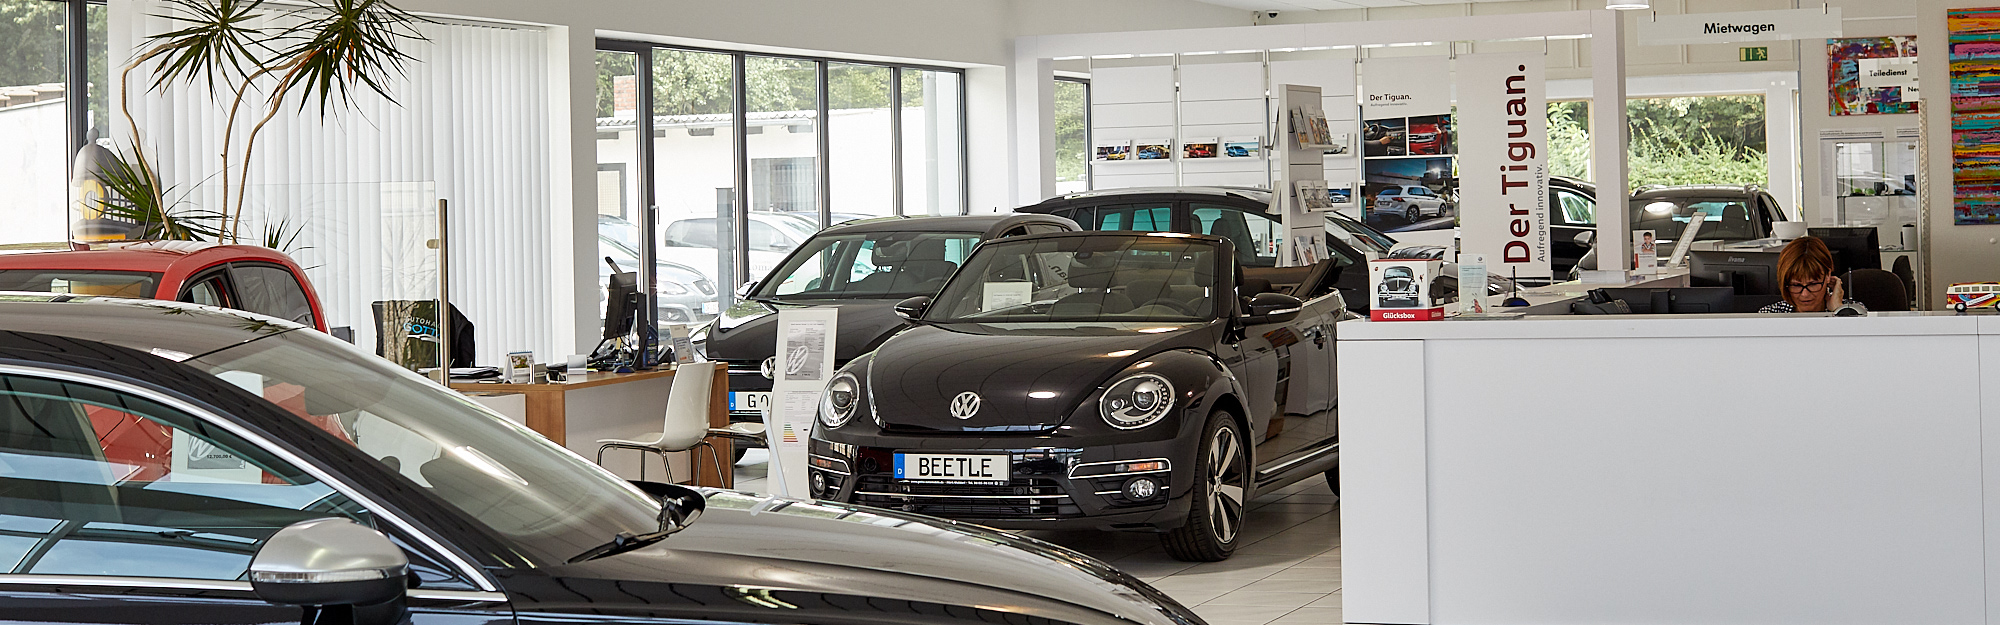 170727-Gotta-Autohaus-030